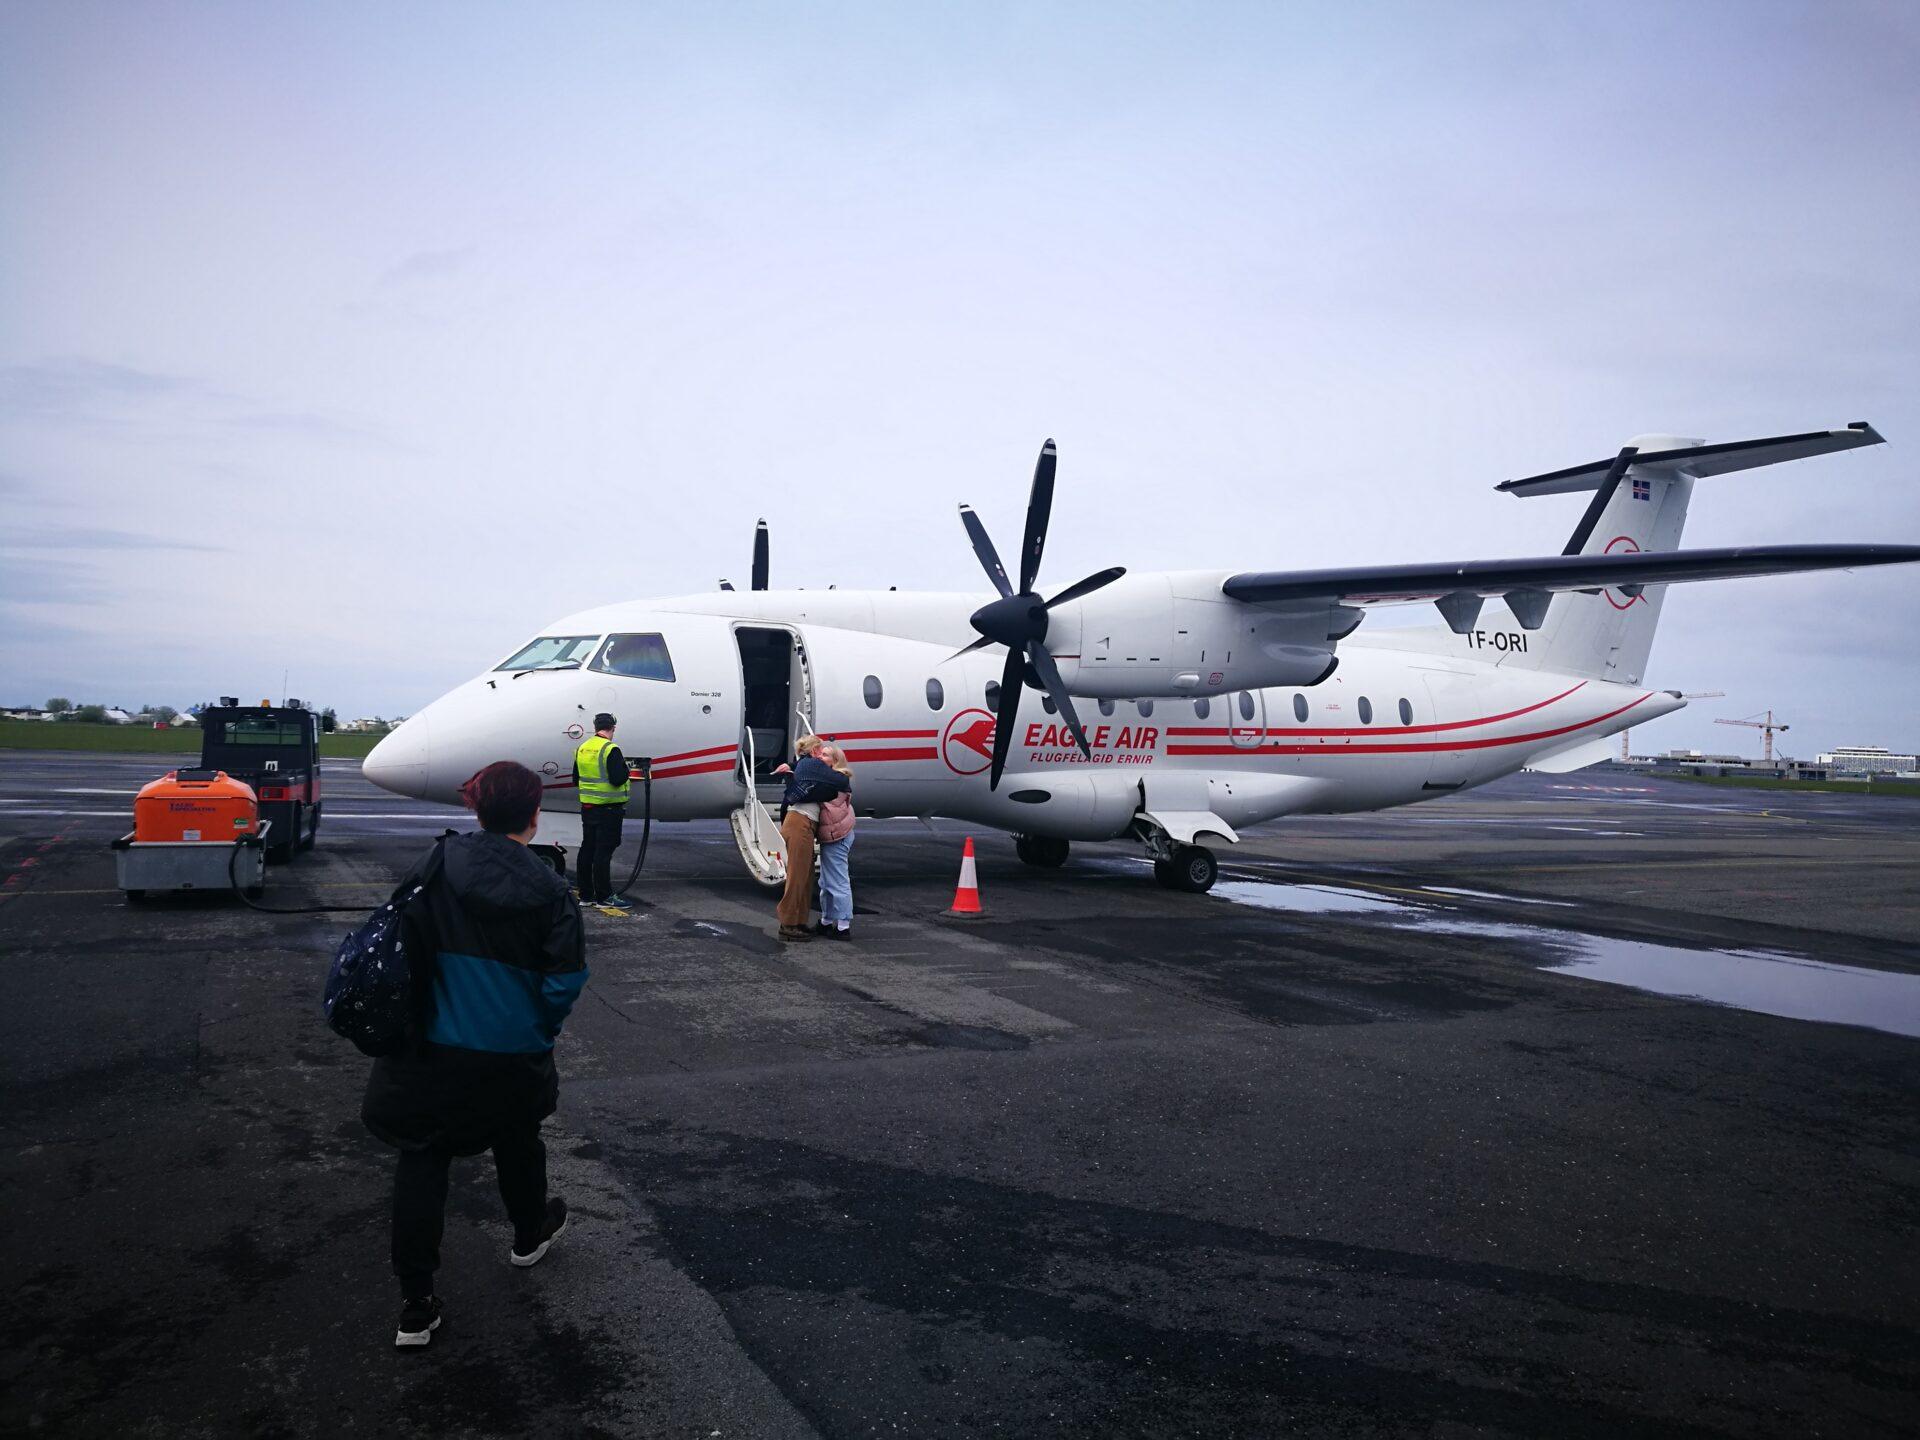 Eagle Air Dornier Do328 (reg. TF-ORI) in Reykjavik airport // Source: Flugblogg